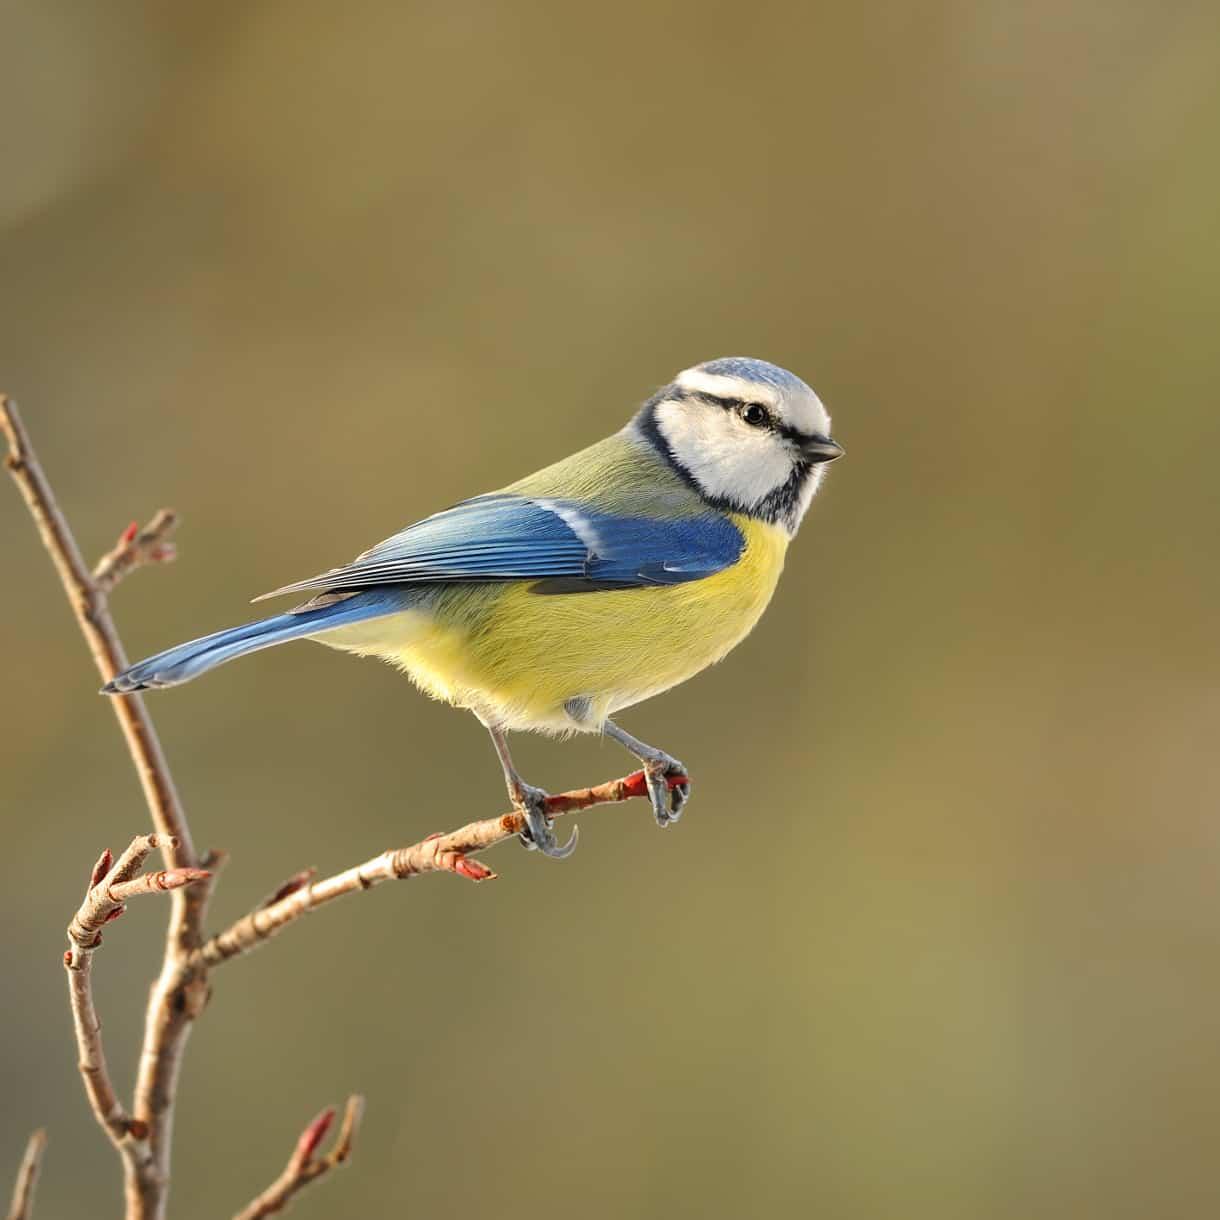 Blue Tit on branch